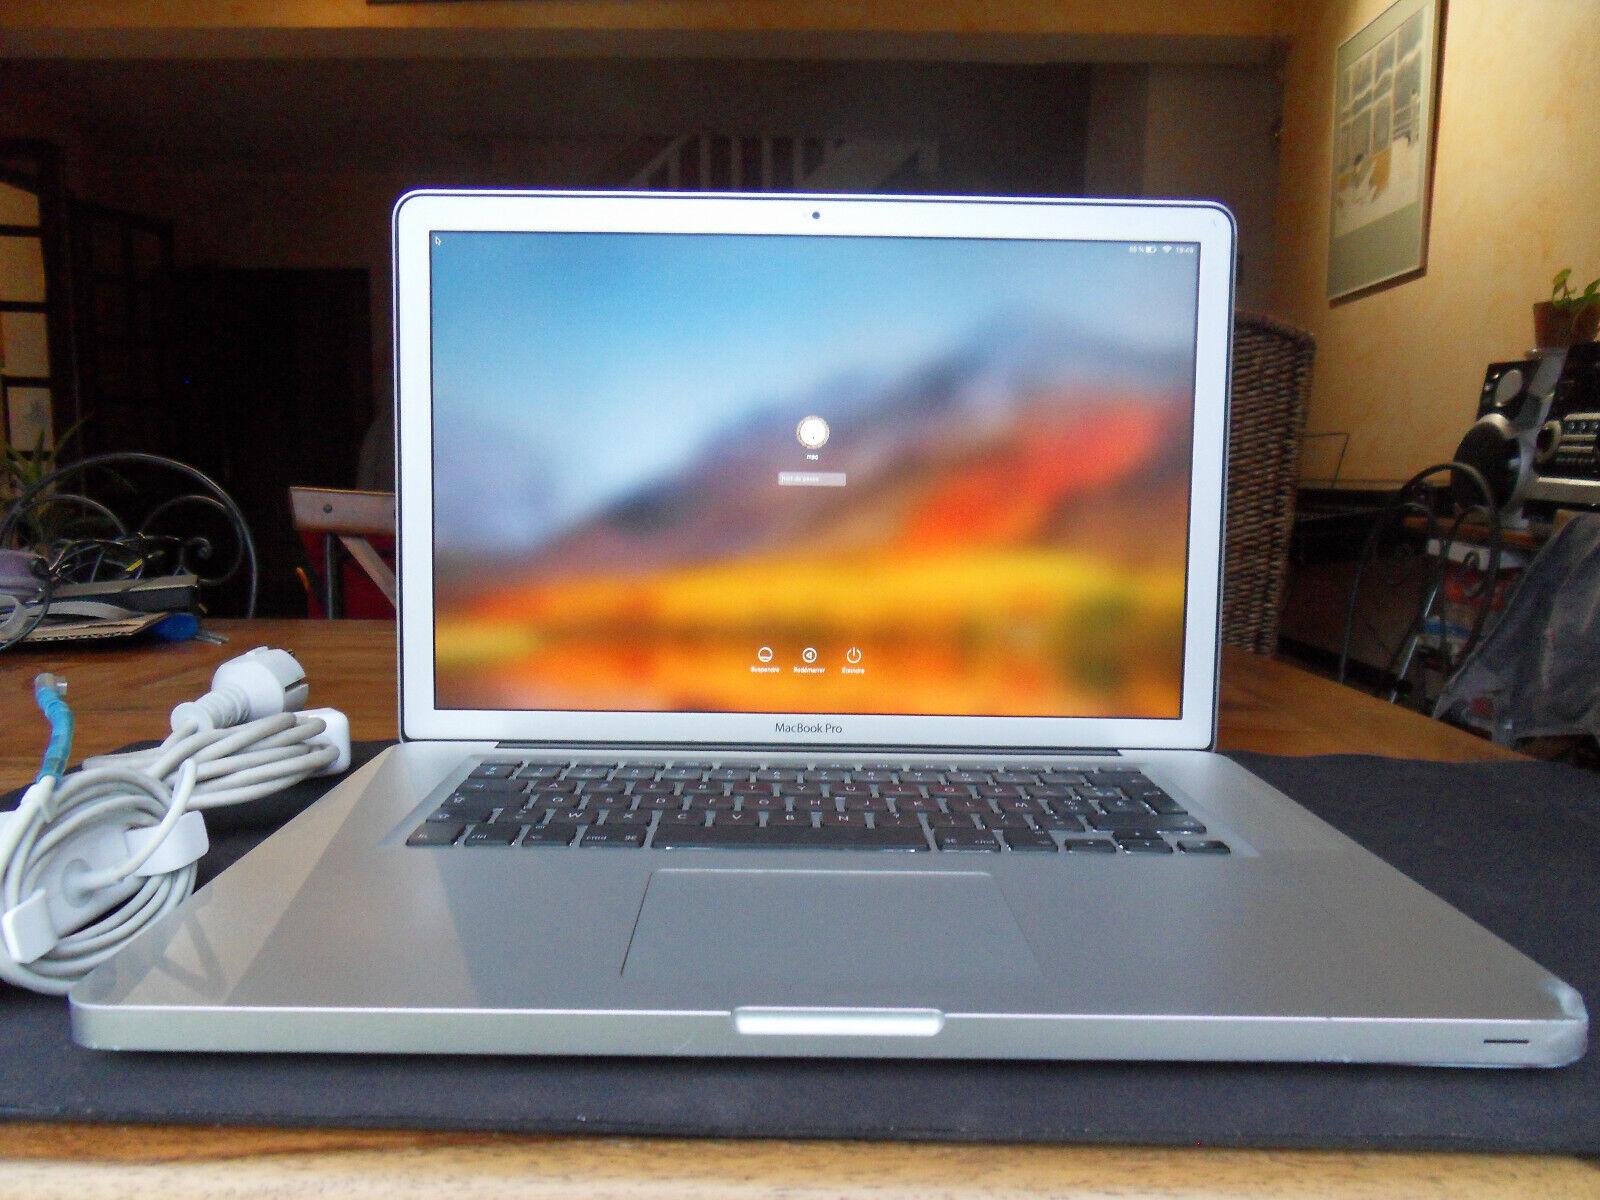 Macbook 15 mi 2010 azerty   i7, 250 go ssd, 8 go ram   lcd mat   défauts mineurs